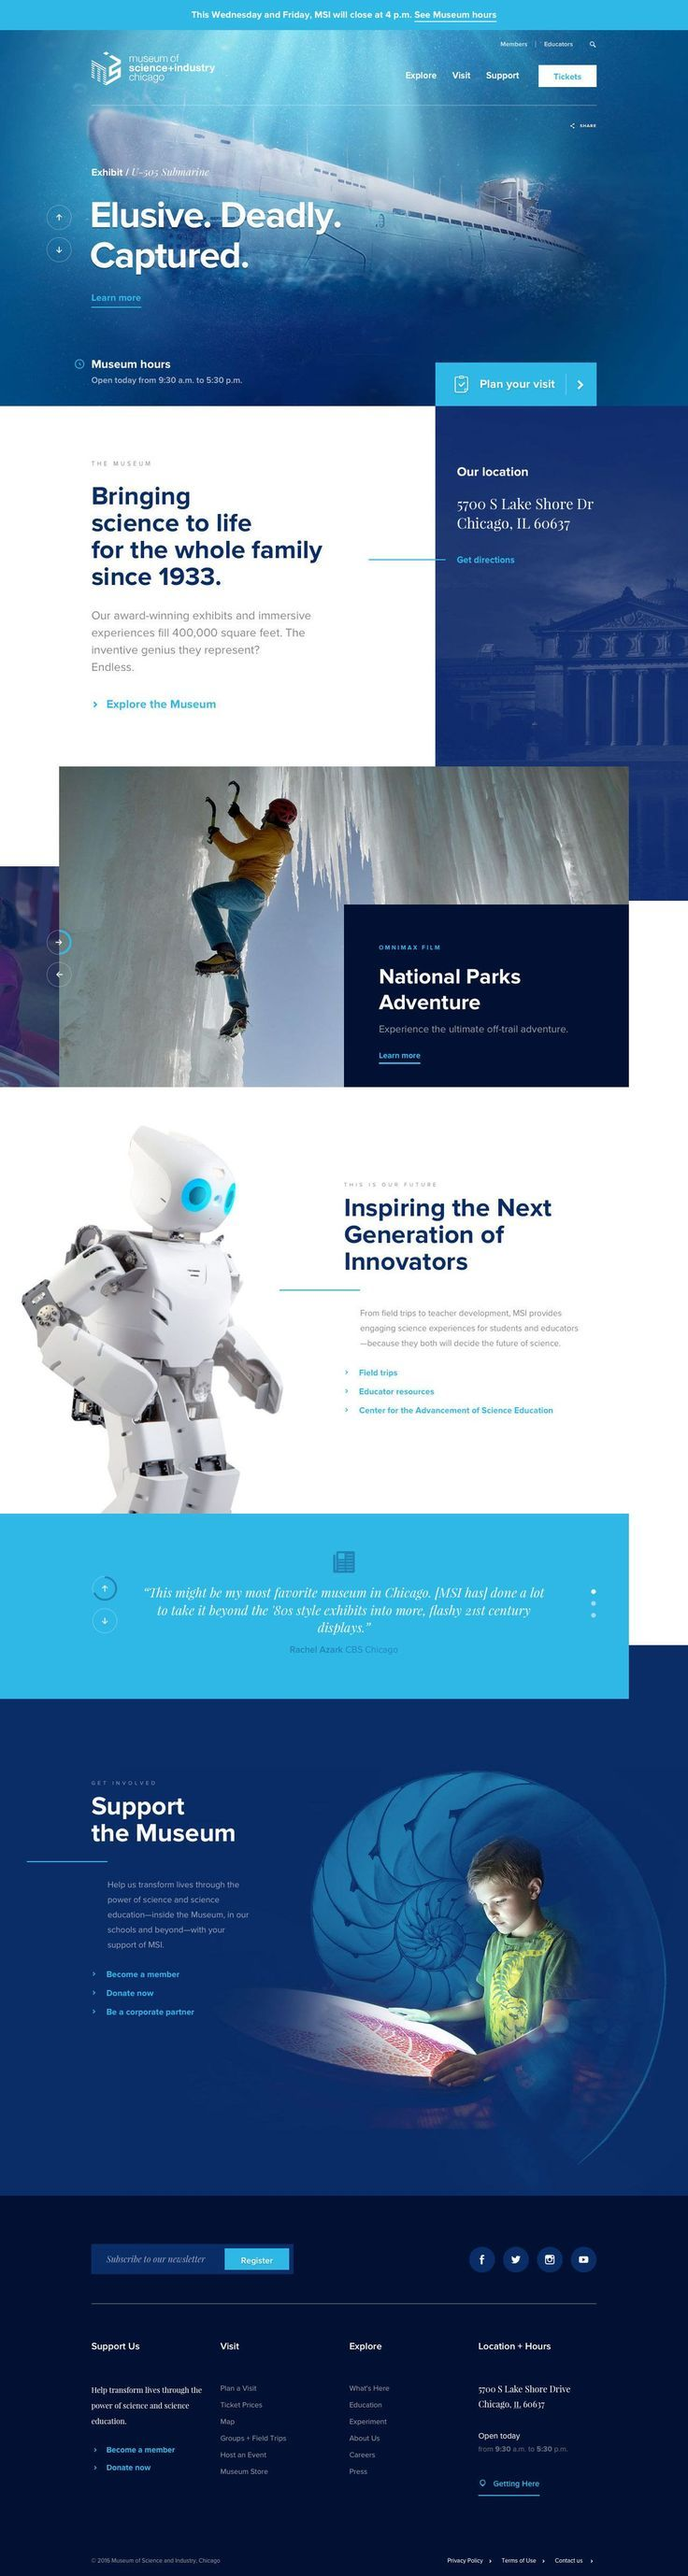 E Book Gratuito Ferramentas Para Websites Museum Of Science And Industry Of Chicago More Web Design Inspir Web Design Inspiration Web Design Web Design Tips